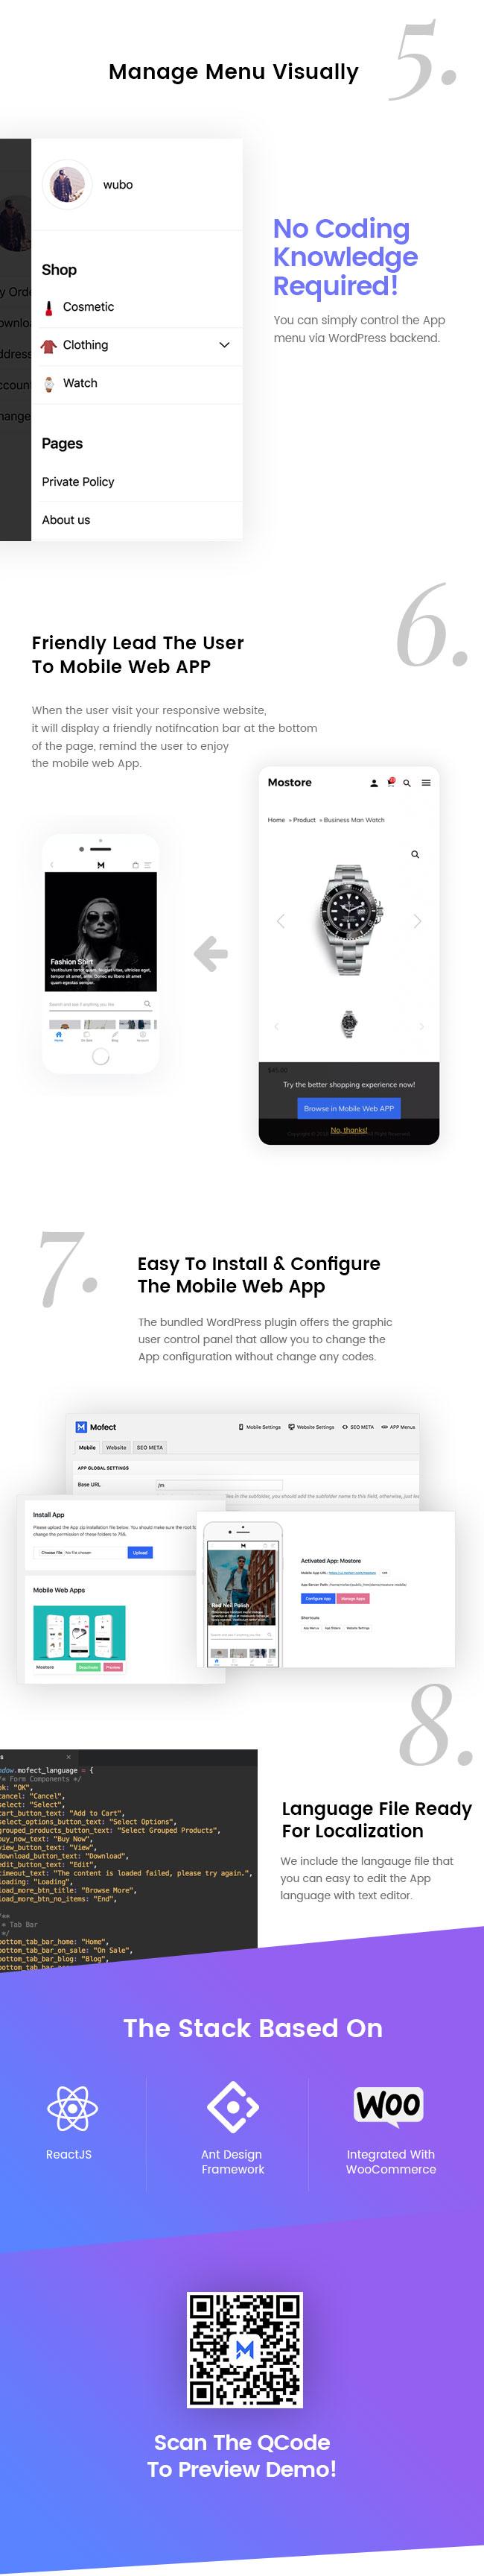 Mostore - WooCommerce Mobile Progressive Web App - 4